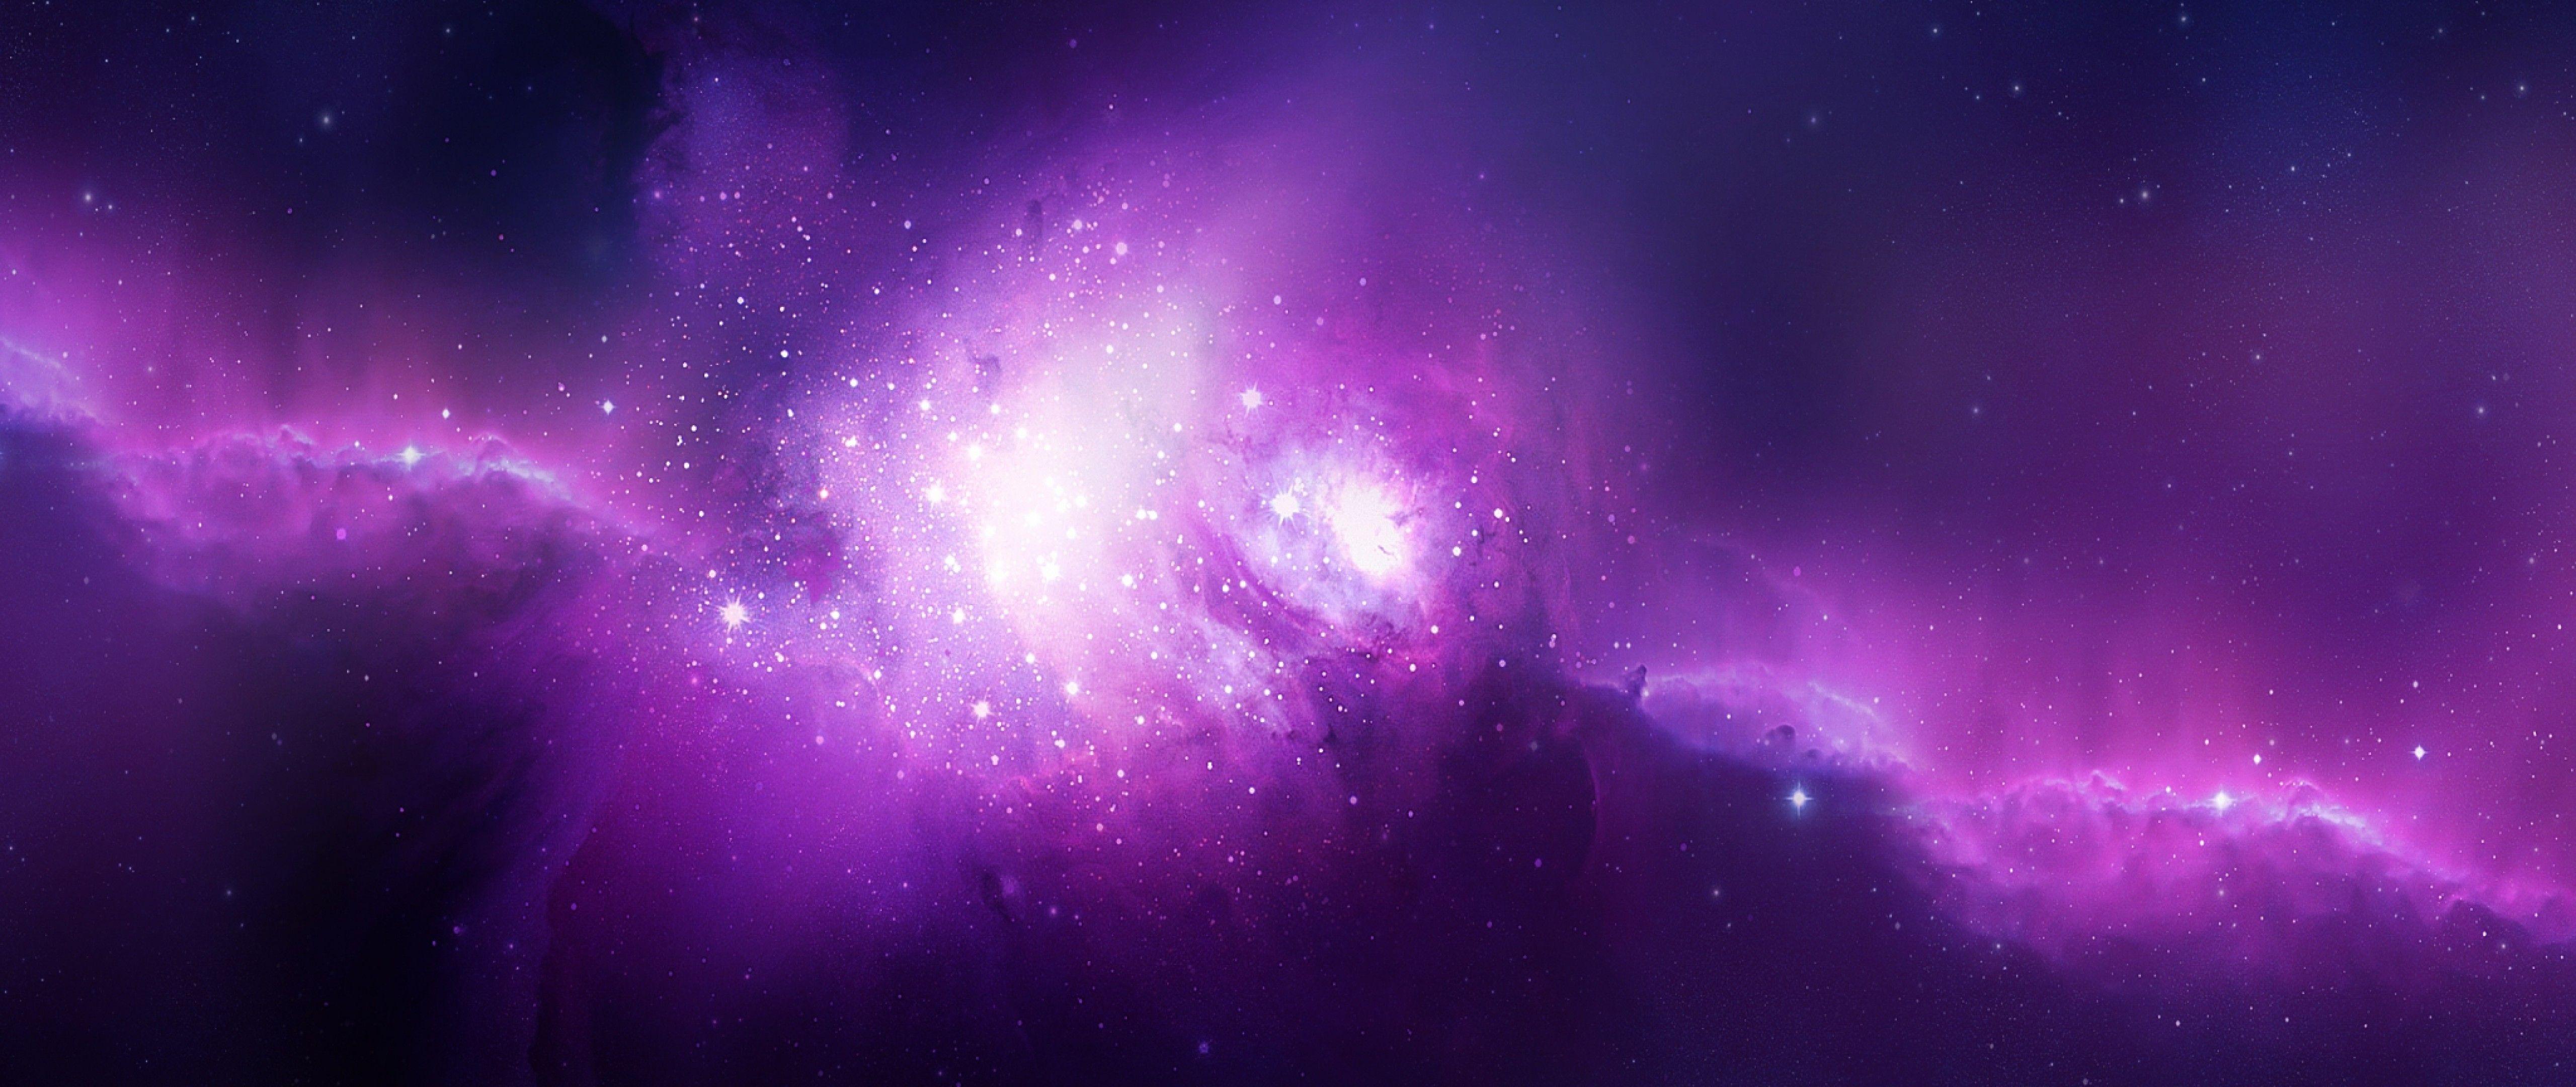 A Visually Stunning Galaxy Nebula Wallpaper Ultra Wide Tv Nebula Wallpaper Android Wallpaper Space Wallpaper Space